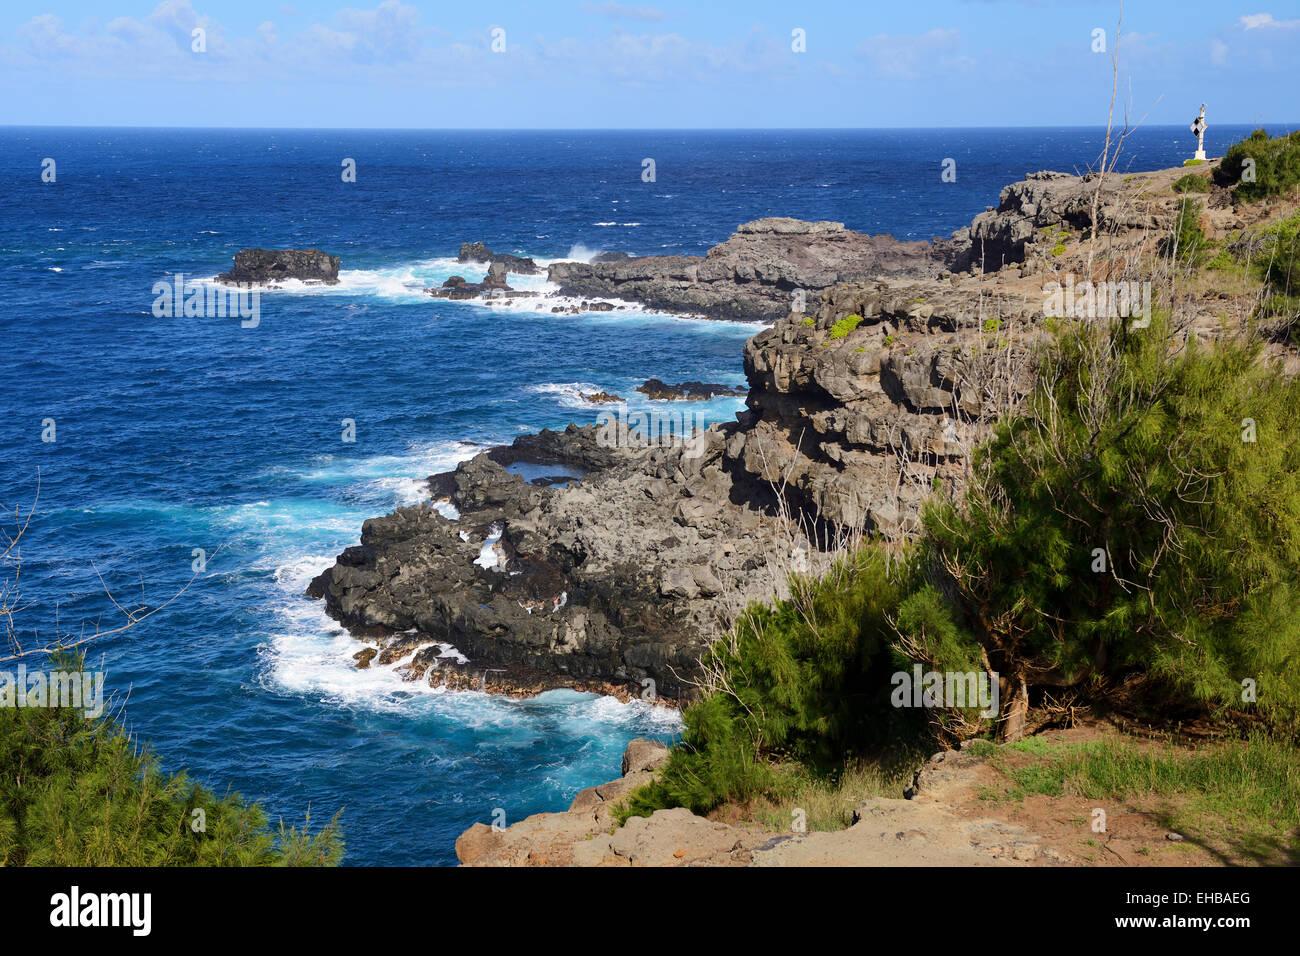 5 Best Beaches in Maui: Hawaii | TOURISM WORLD